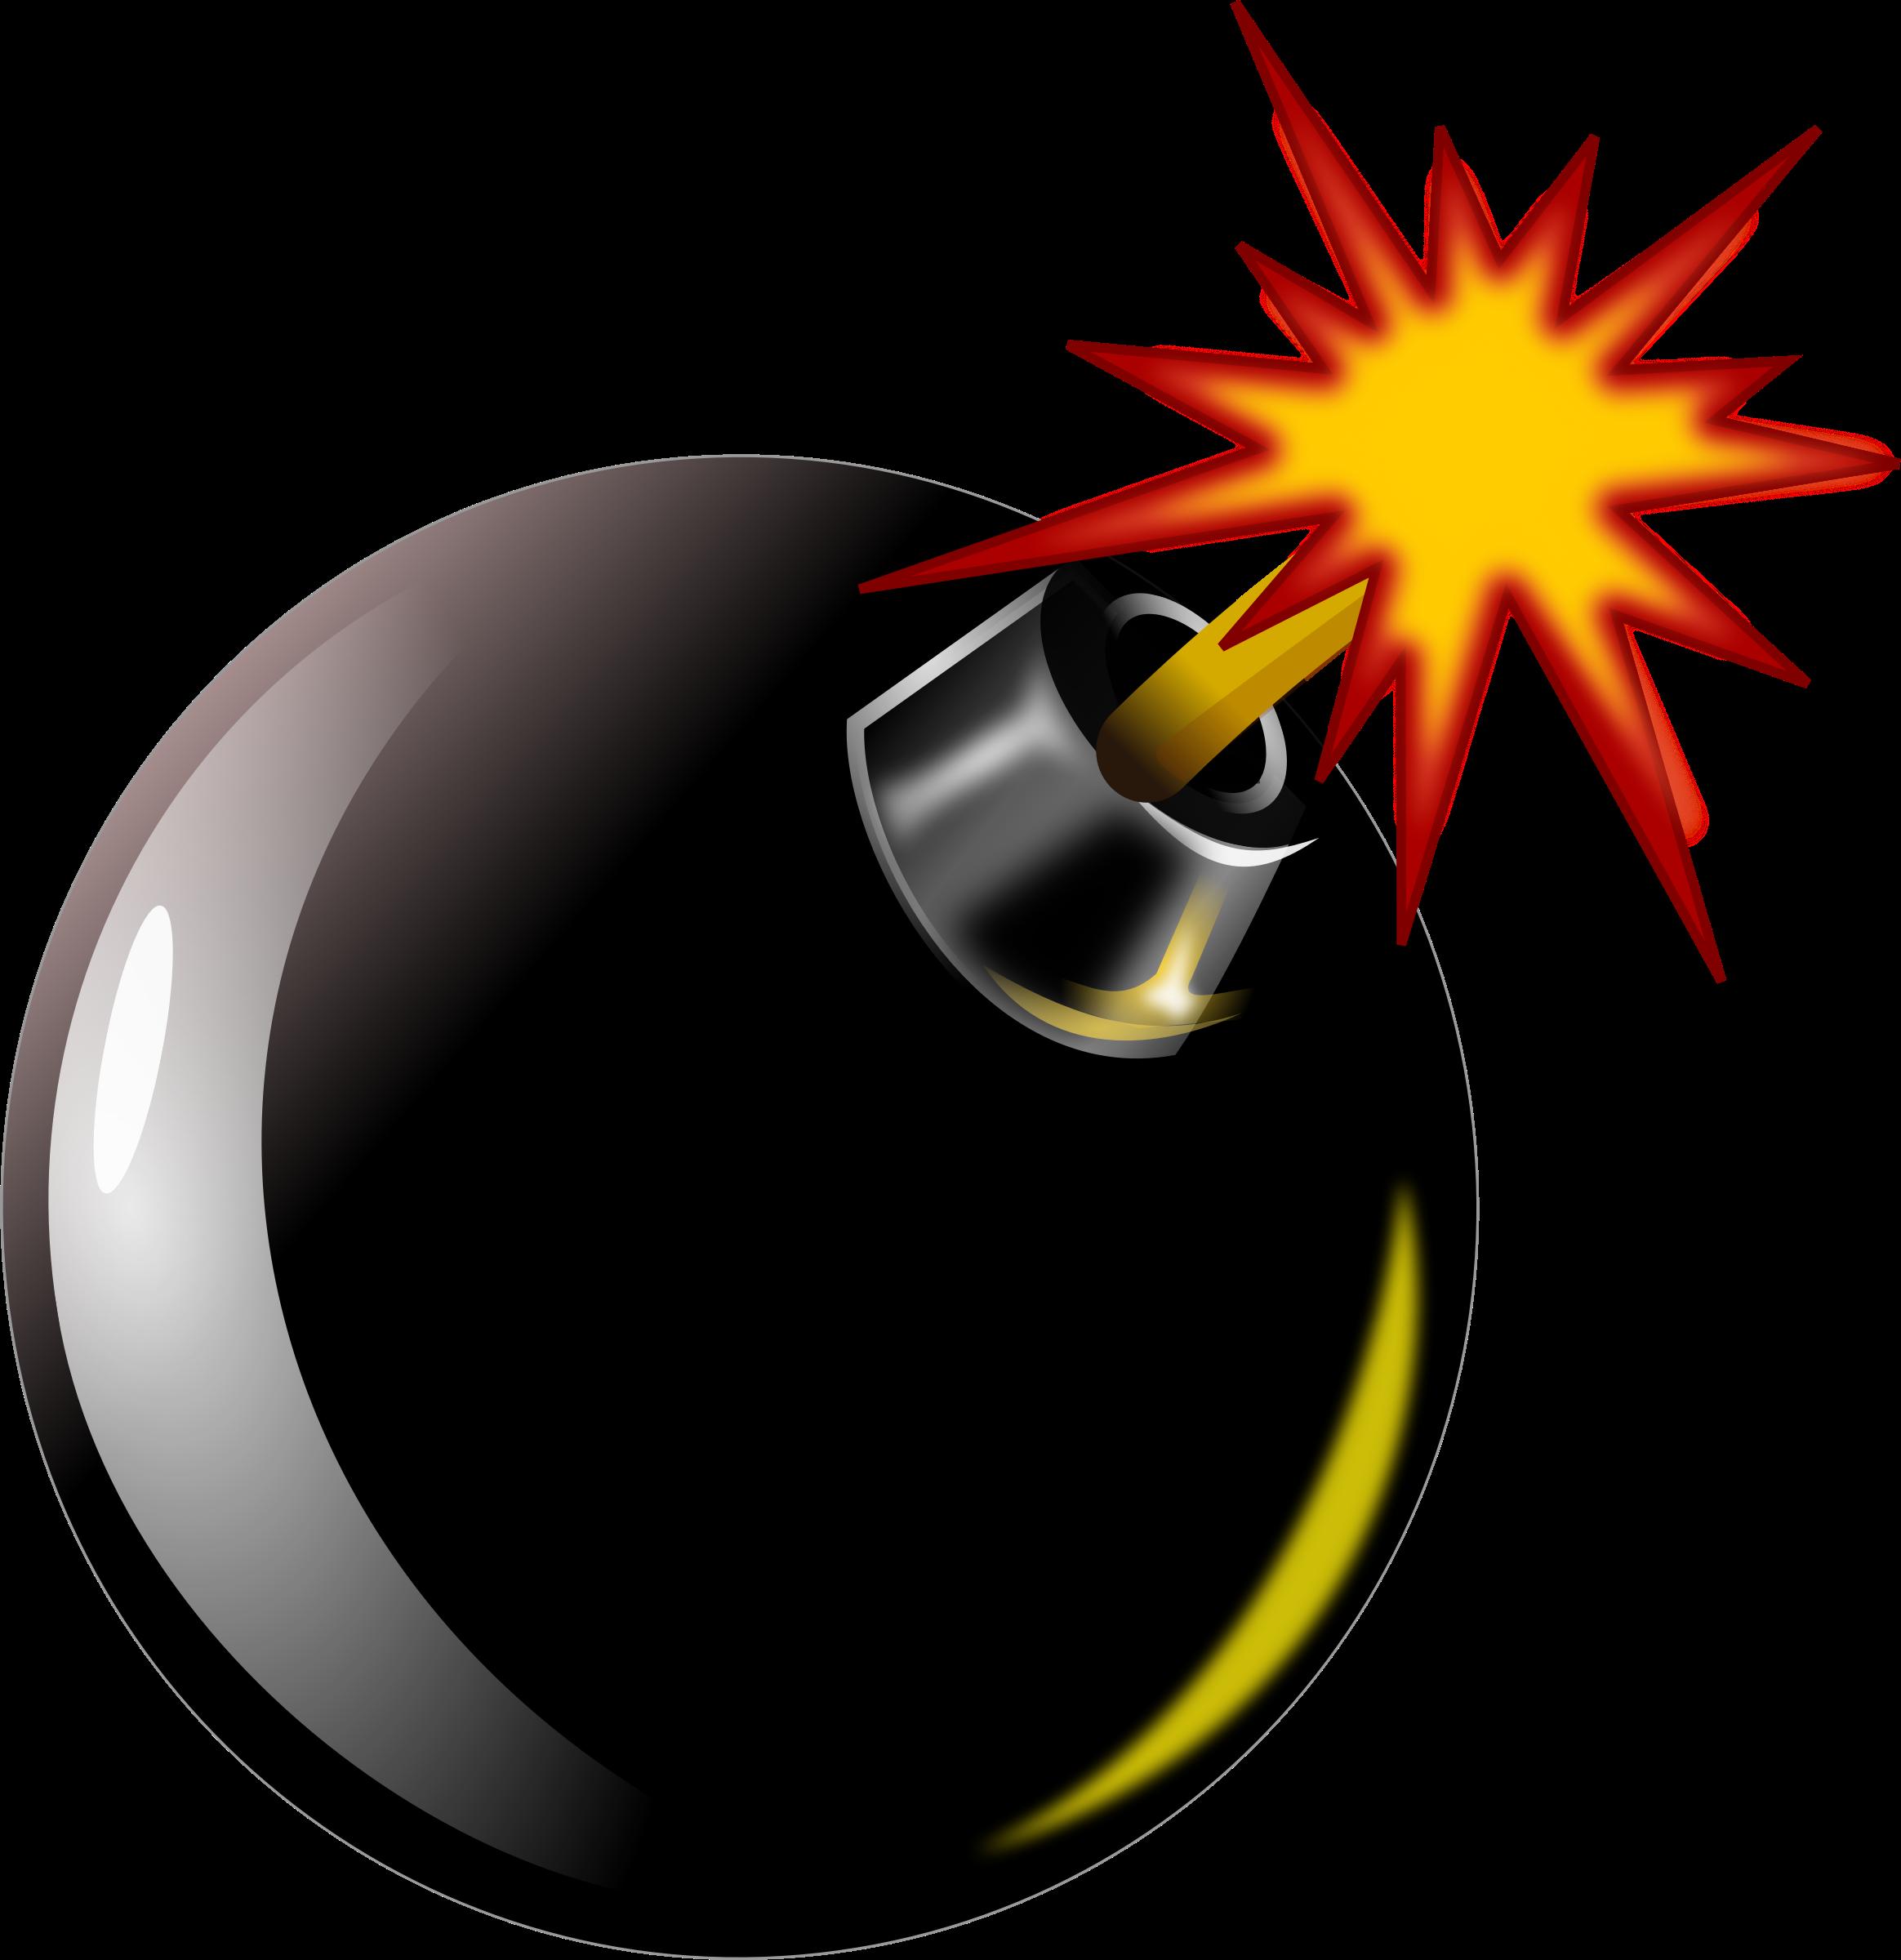 . Bomb clipart fuse